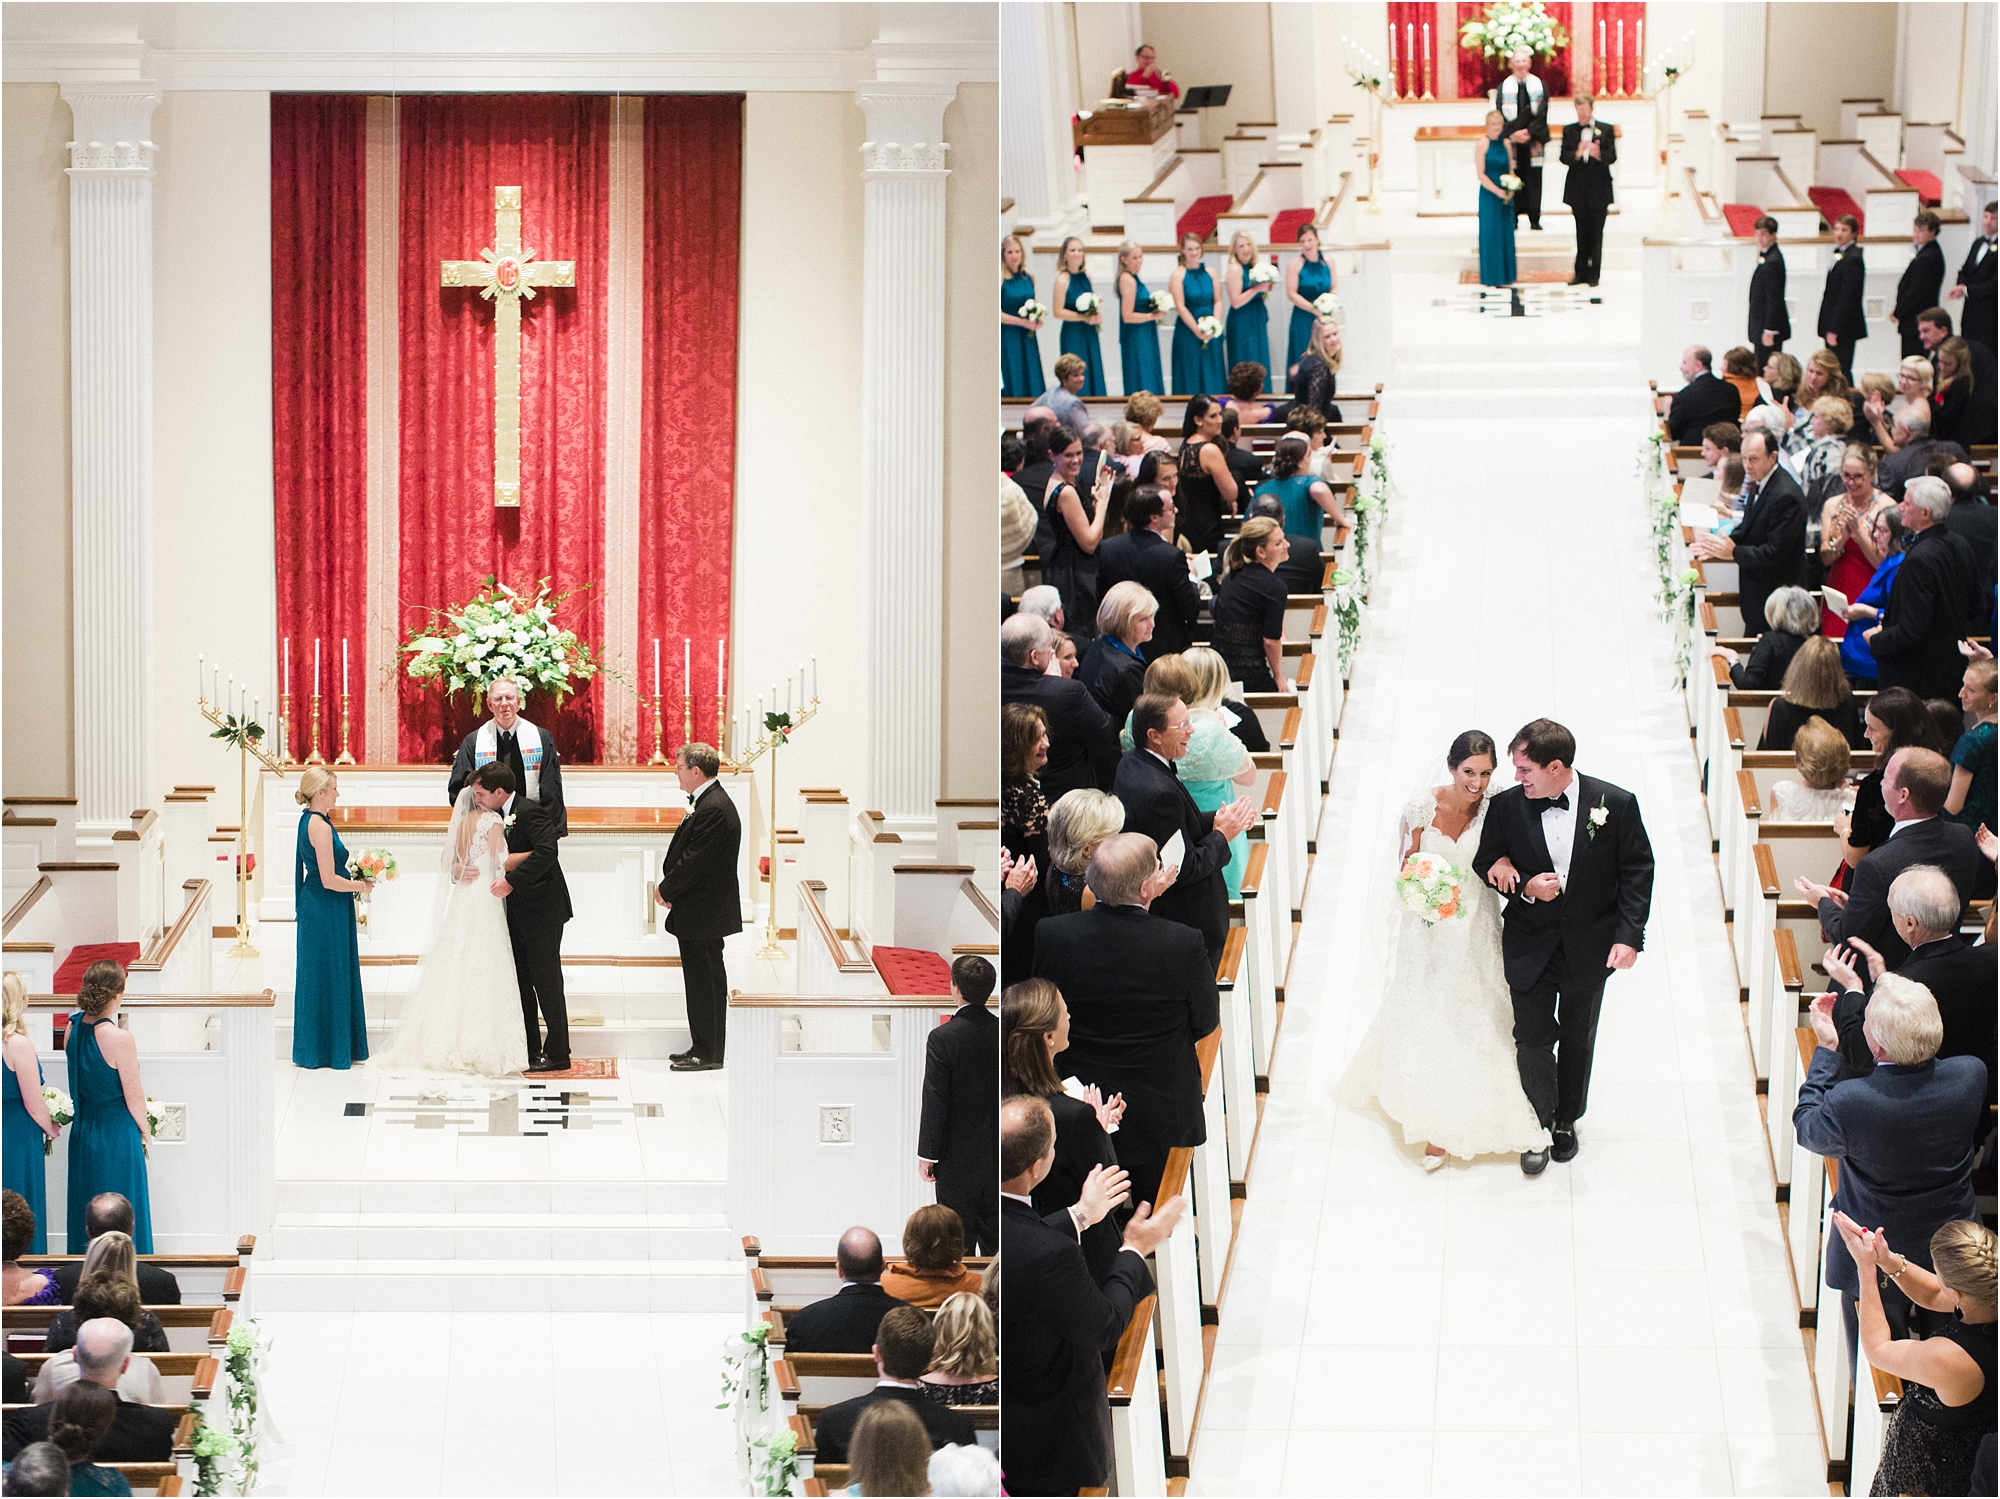 stephanie-yonce-photography-richmond-virginia-country-club-wedding-photo_027.JPG